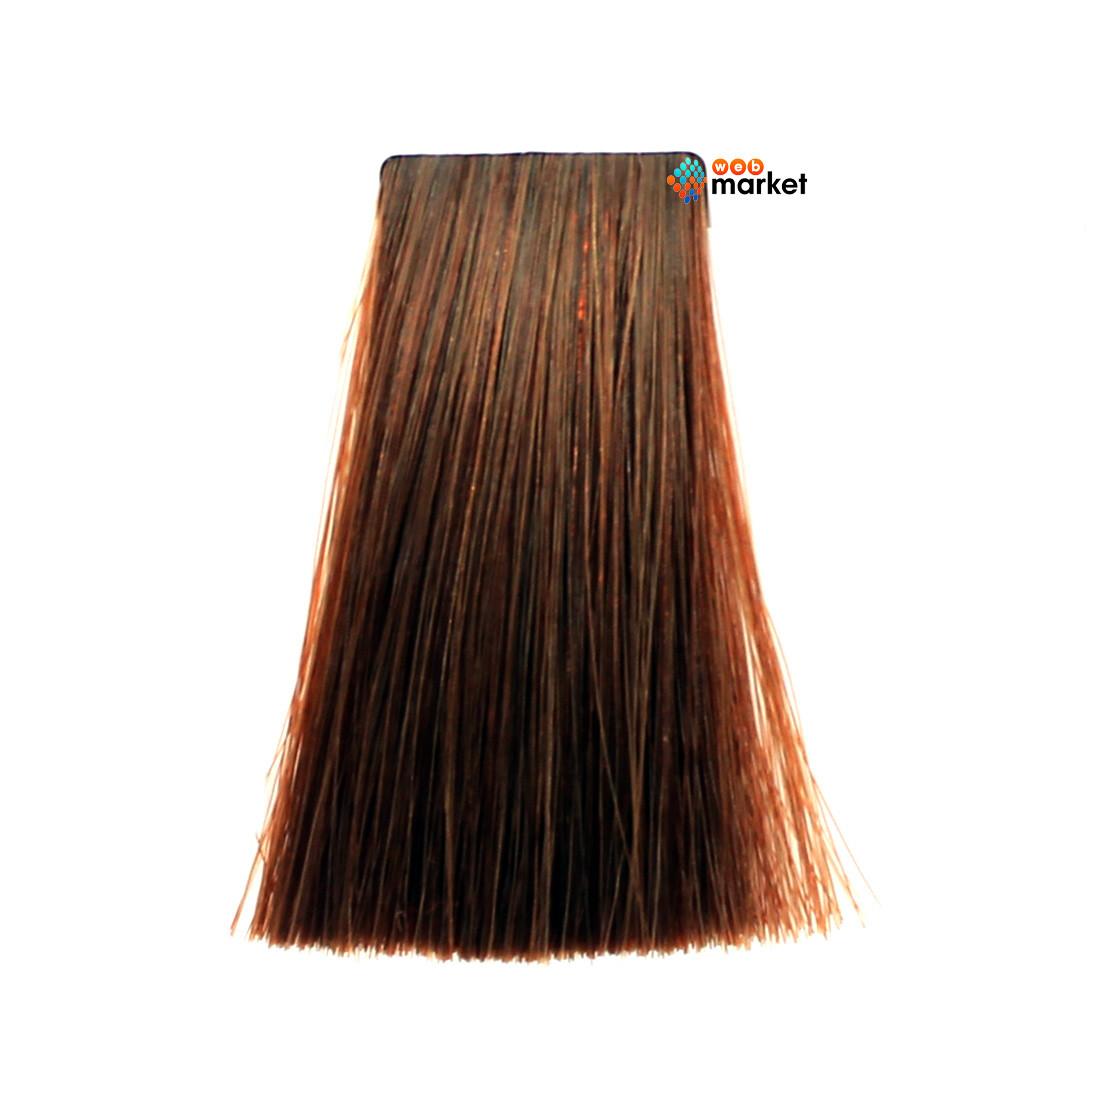 Краска для волос L'Oreal Inoa 5.45 60 г